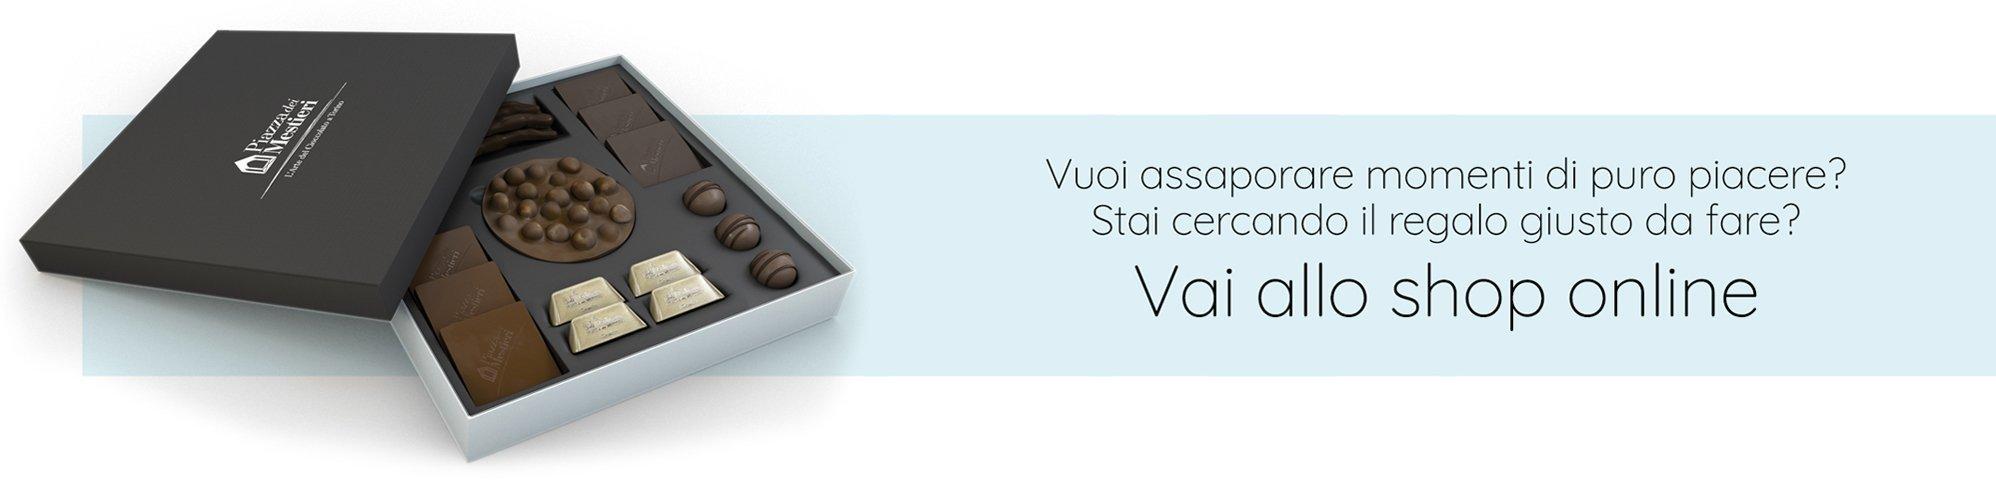 shop online cioccolato artigianale